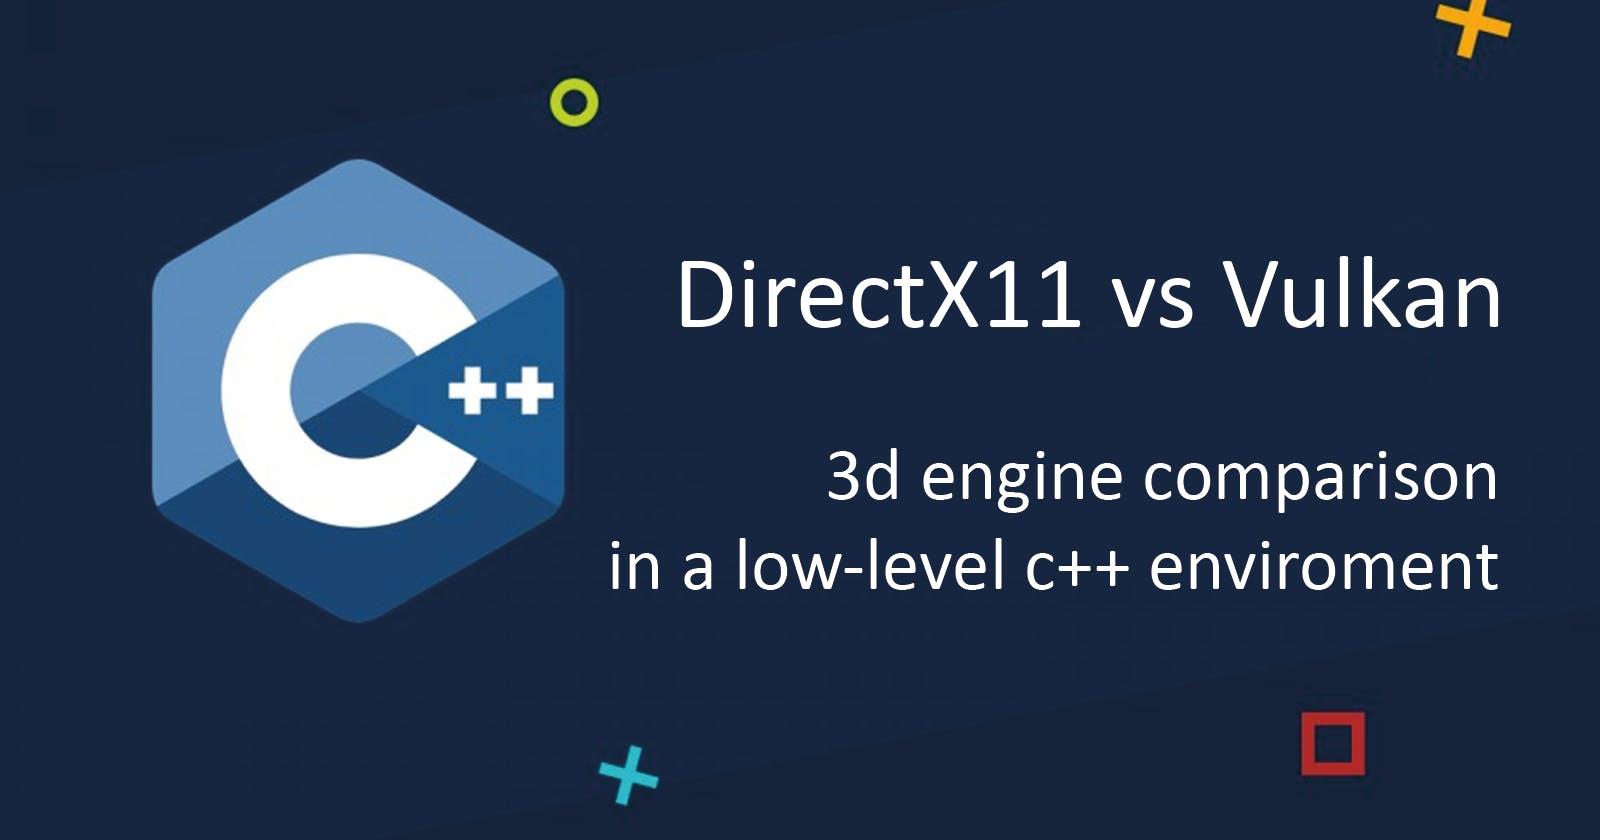 Benchmarking DirectX11 vs Vulkan in a low-level C++ environment